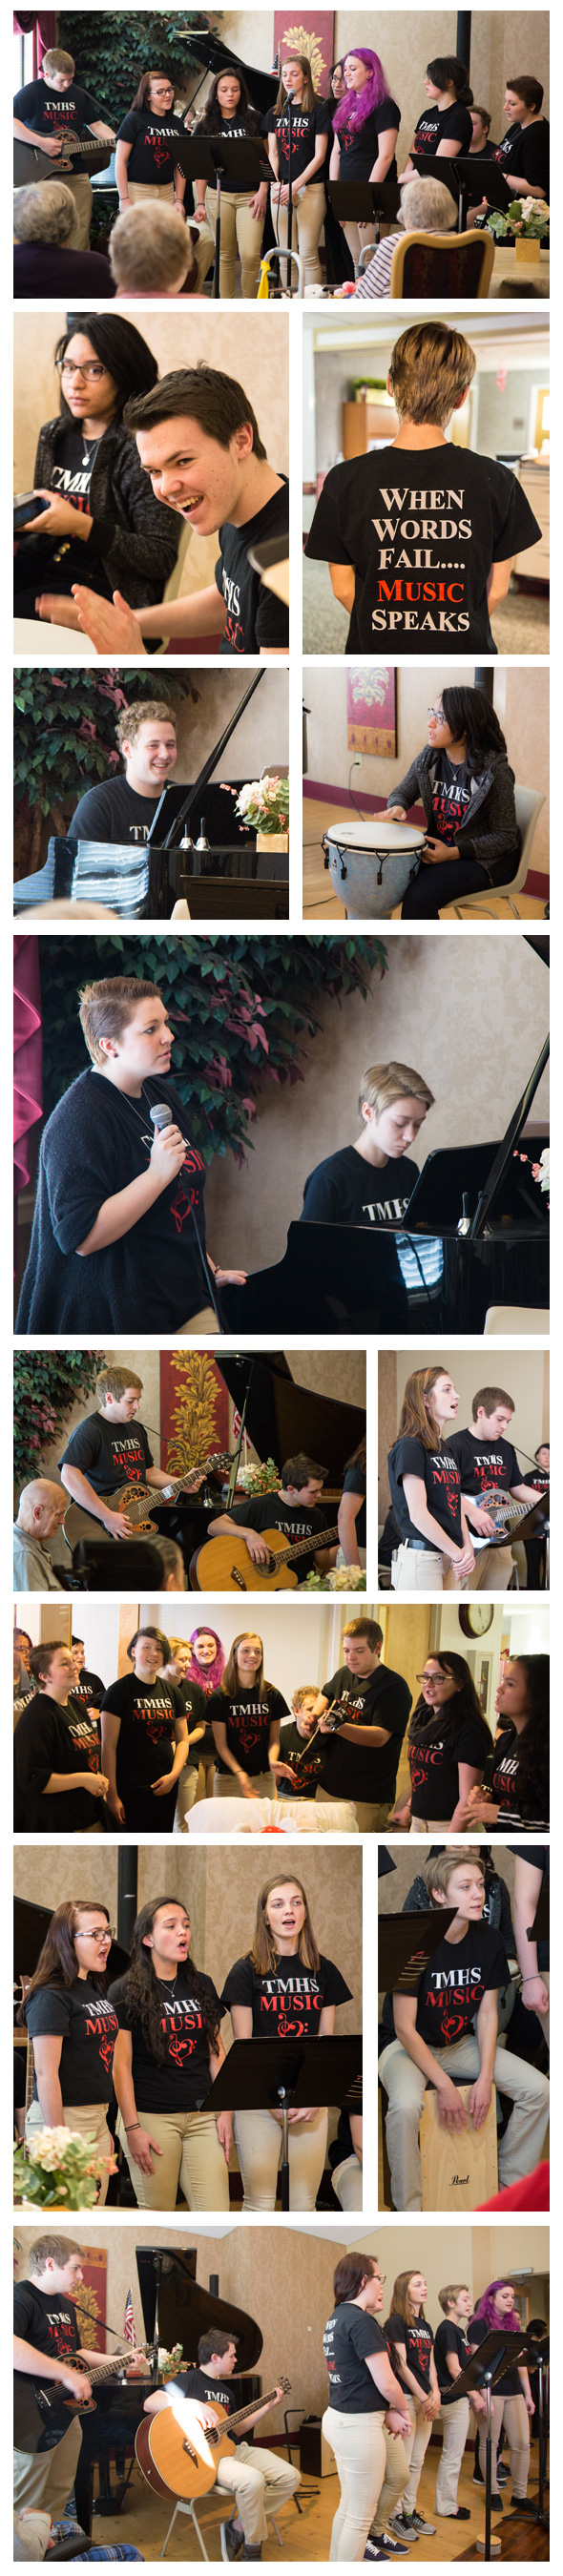 Photo of Tourtellotte Memorial High School Music Ensemble